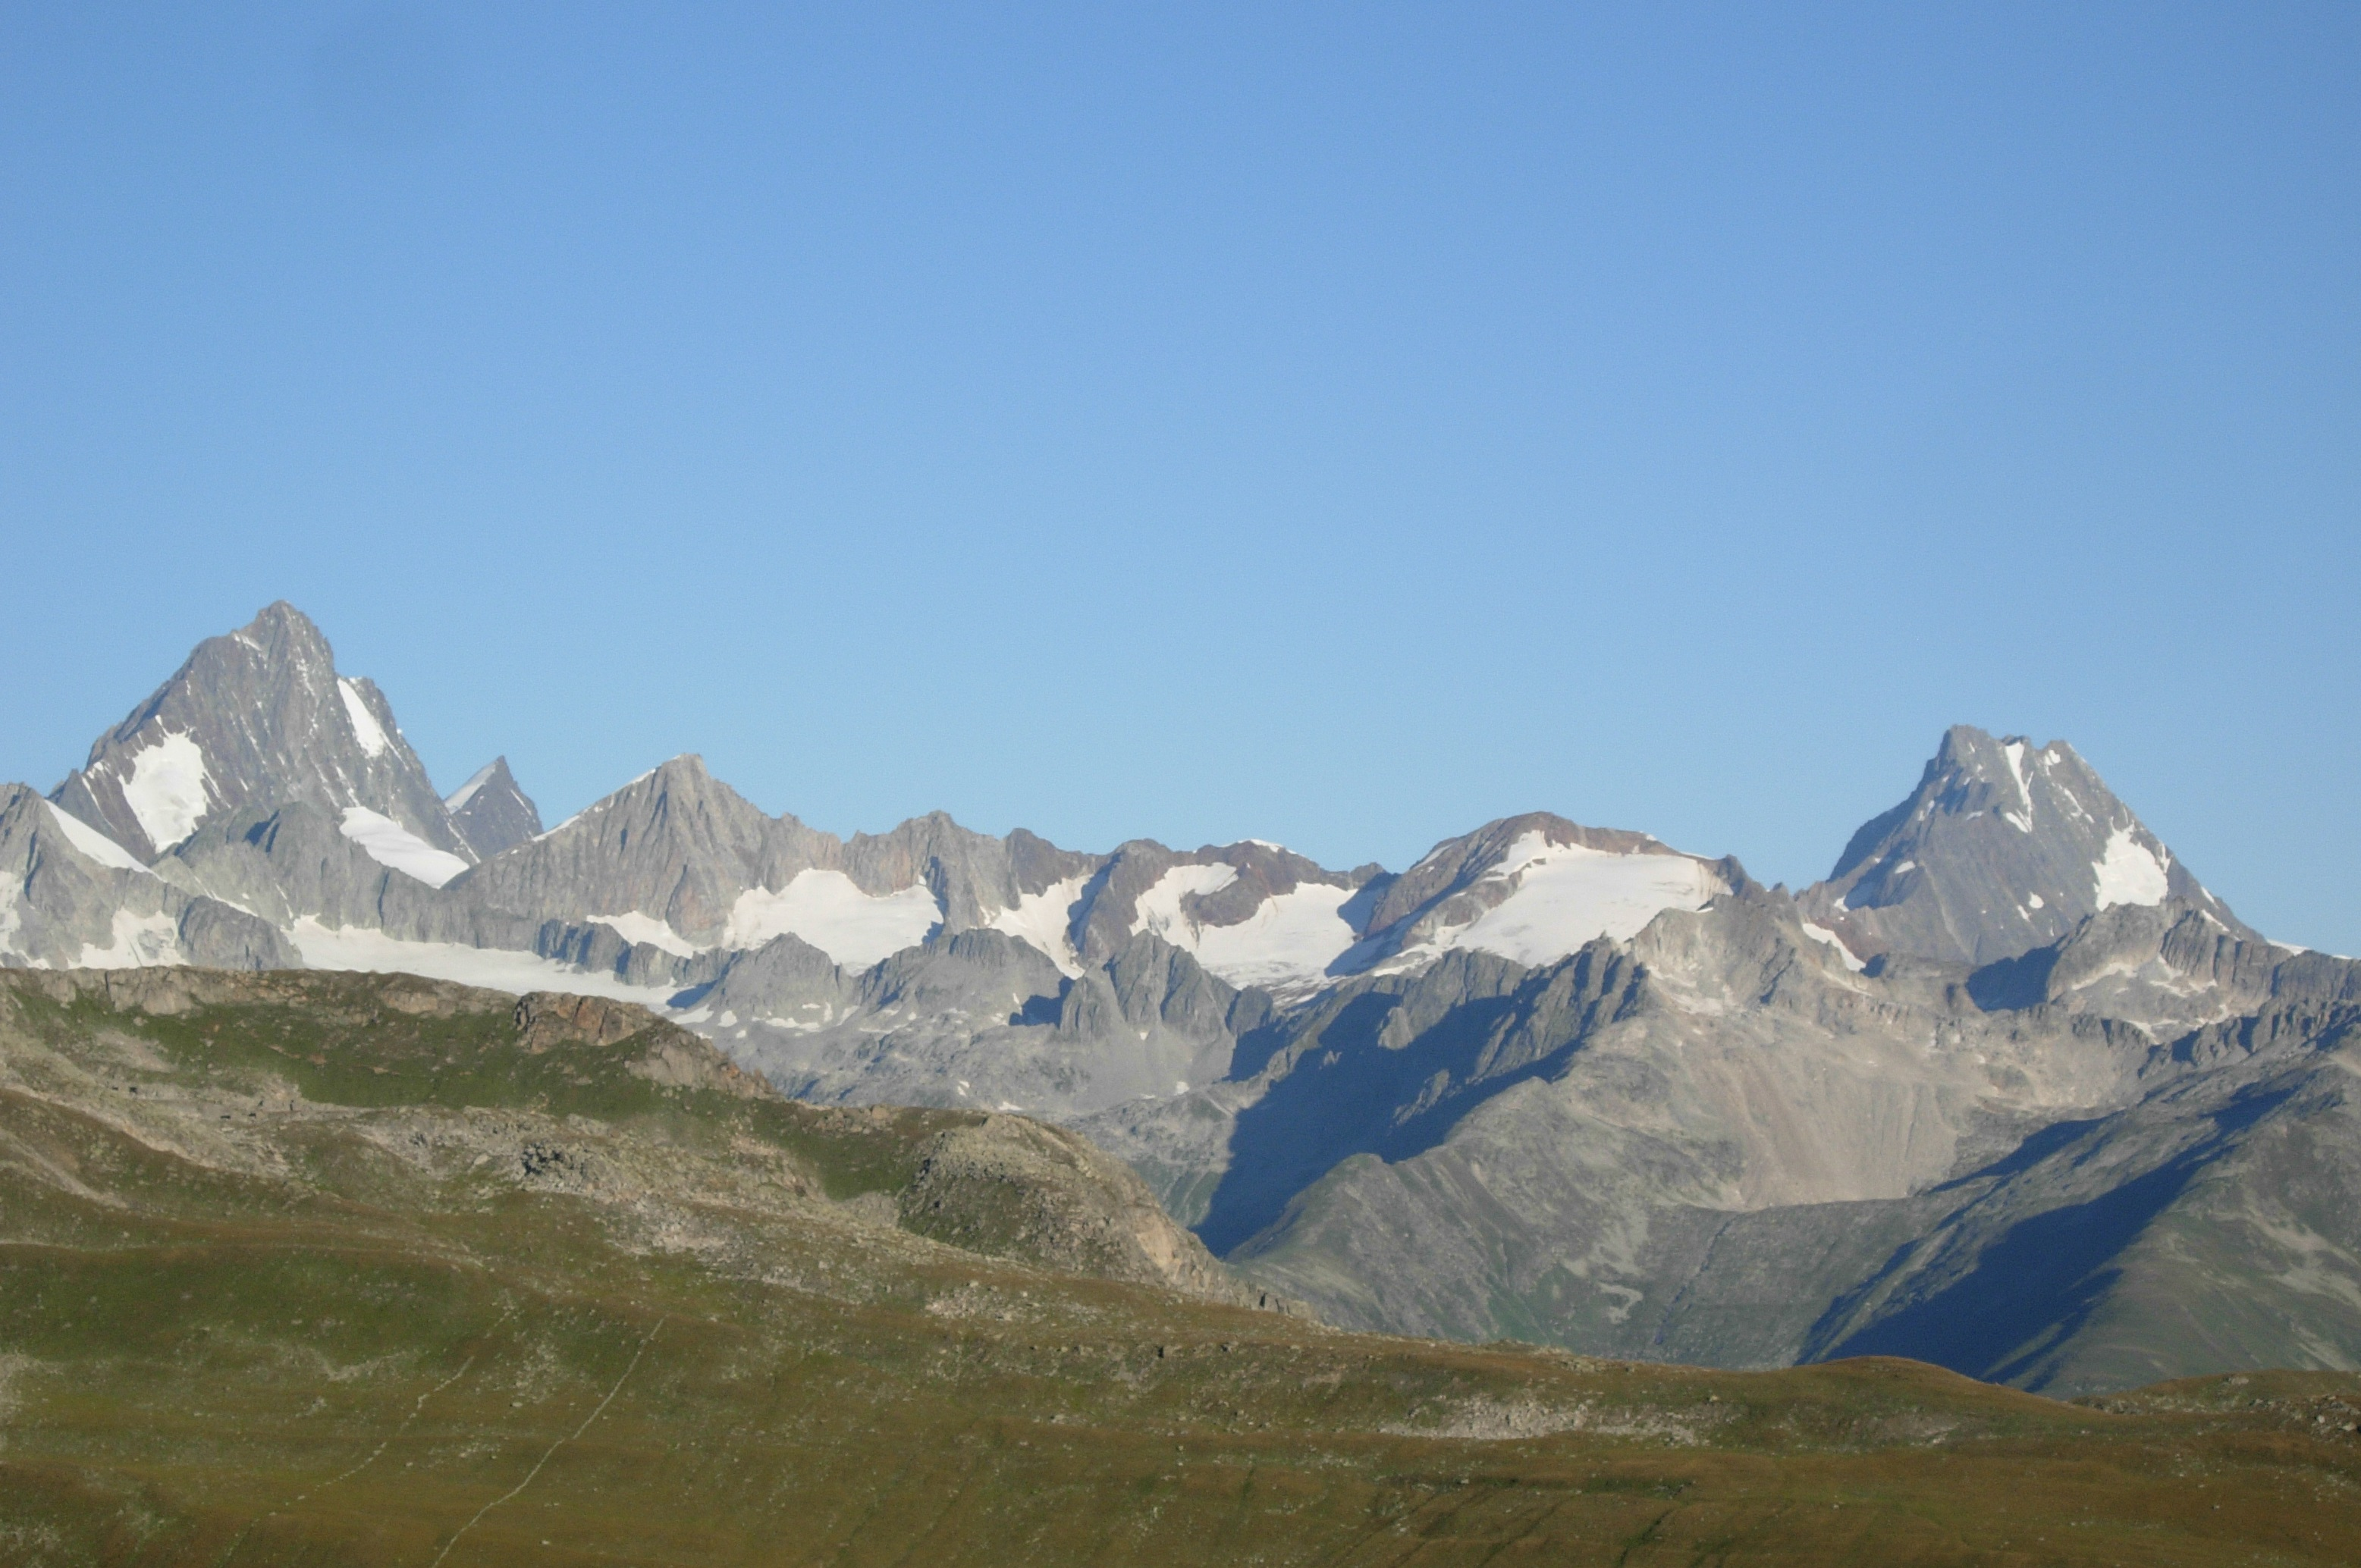 Magnifica vista su Finsteraarhorn e le altre cime vallesane